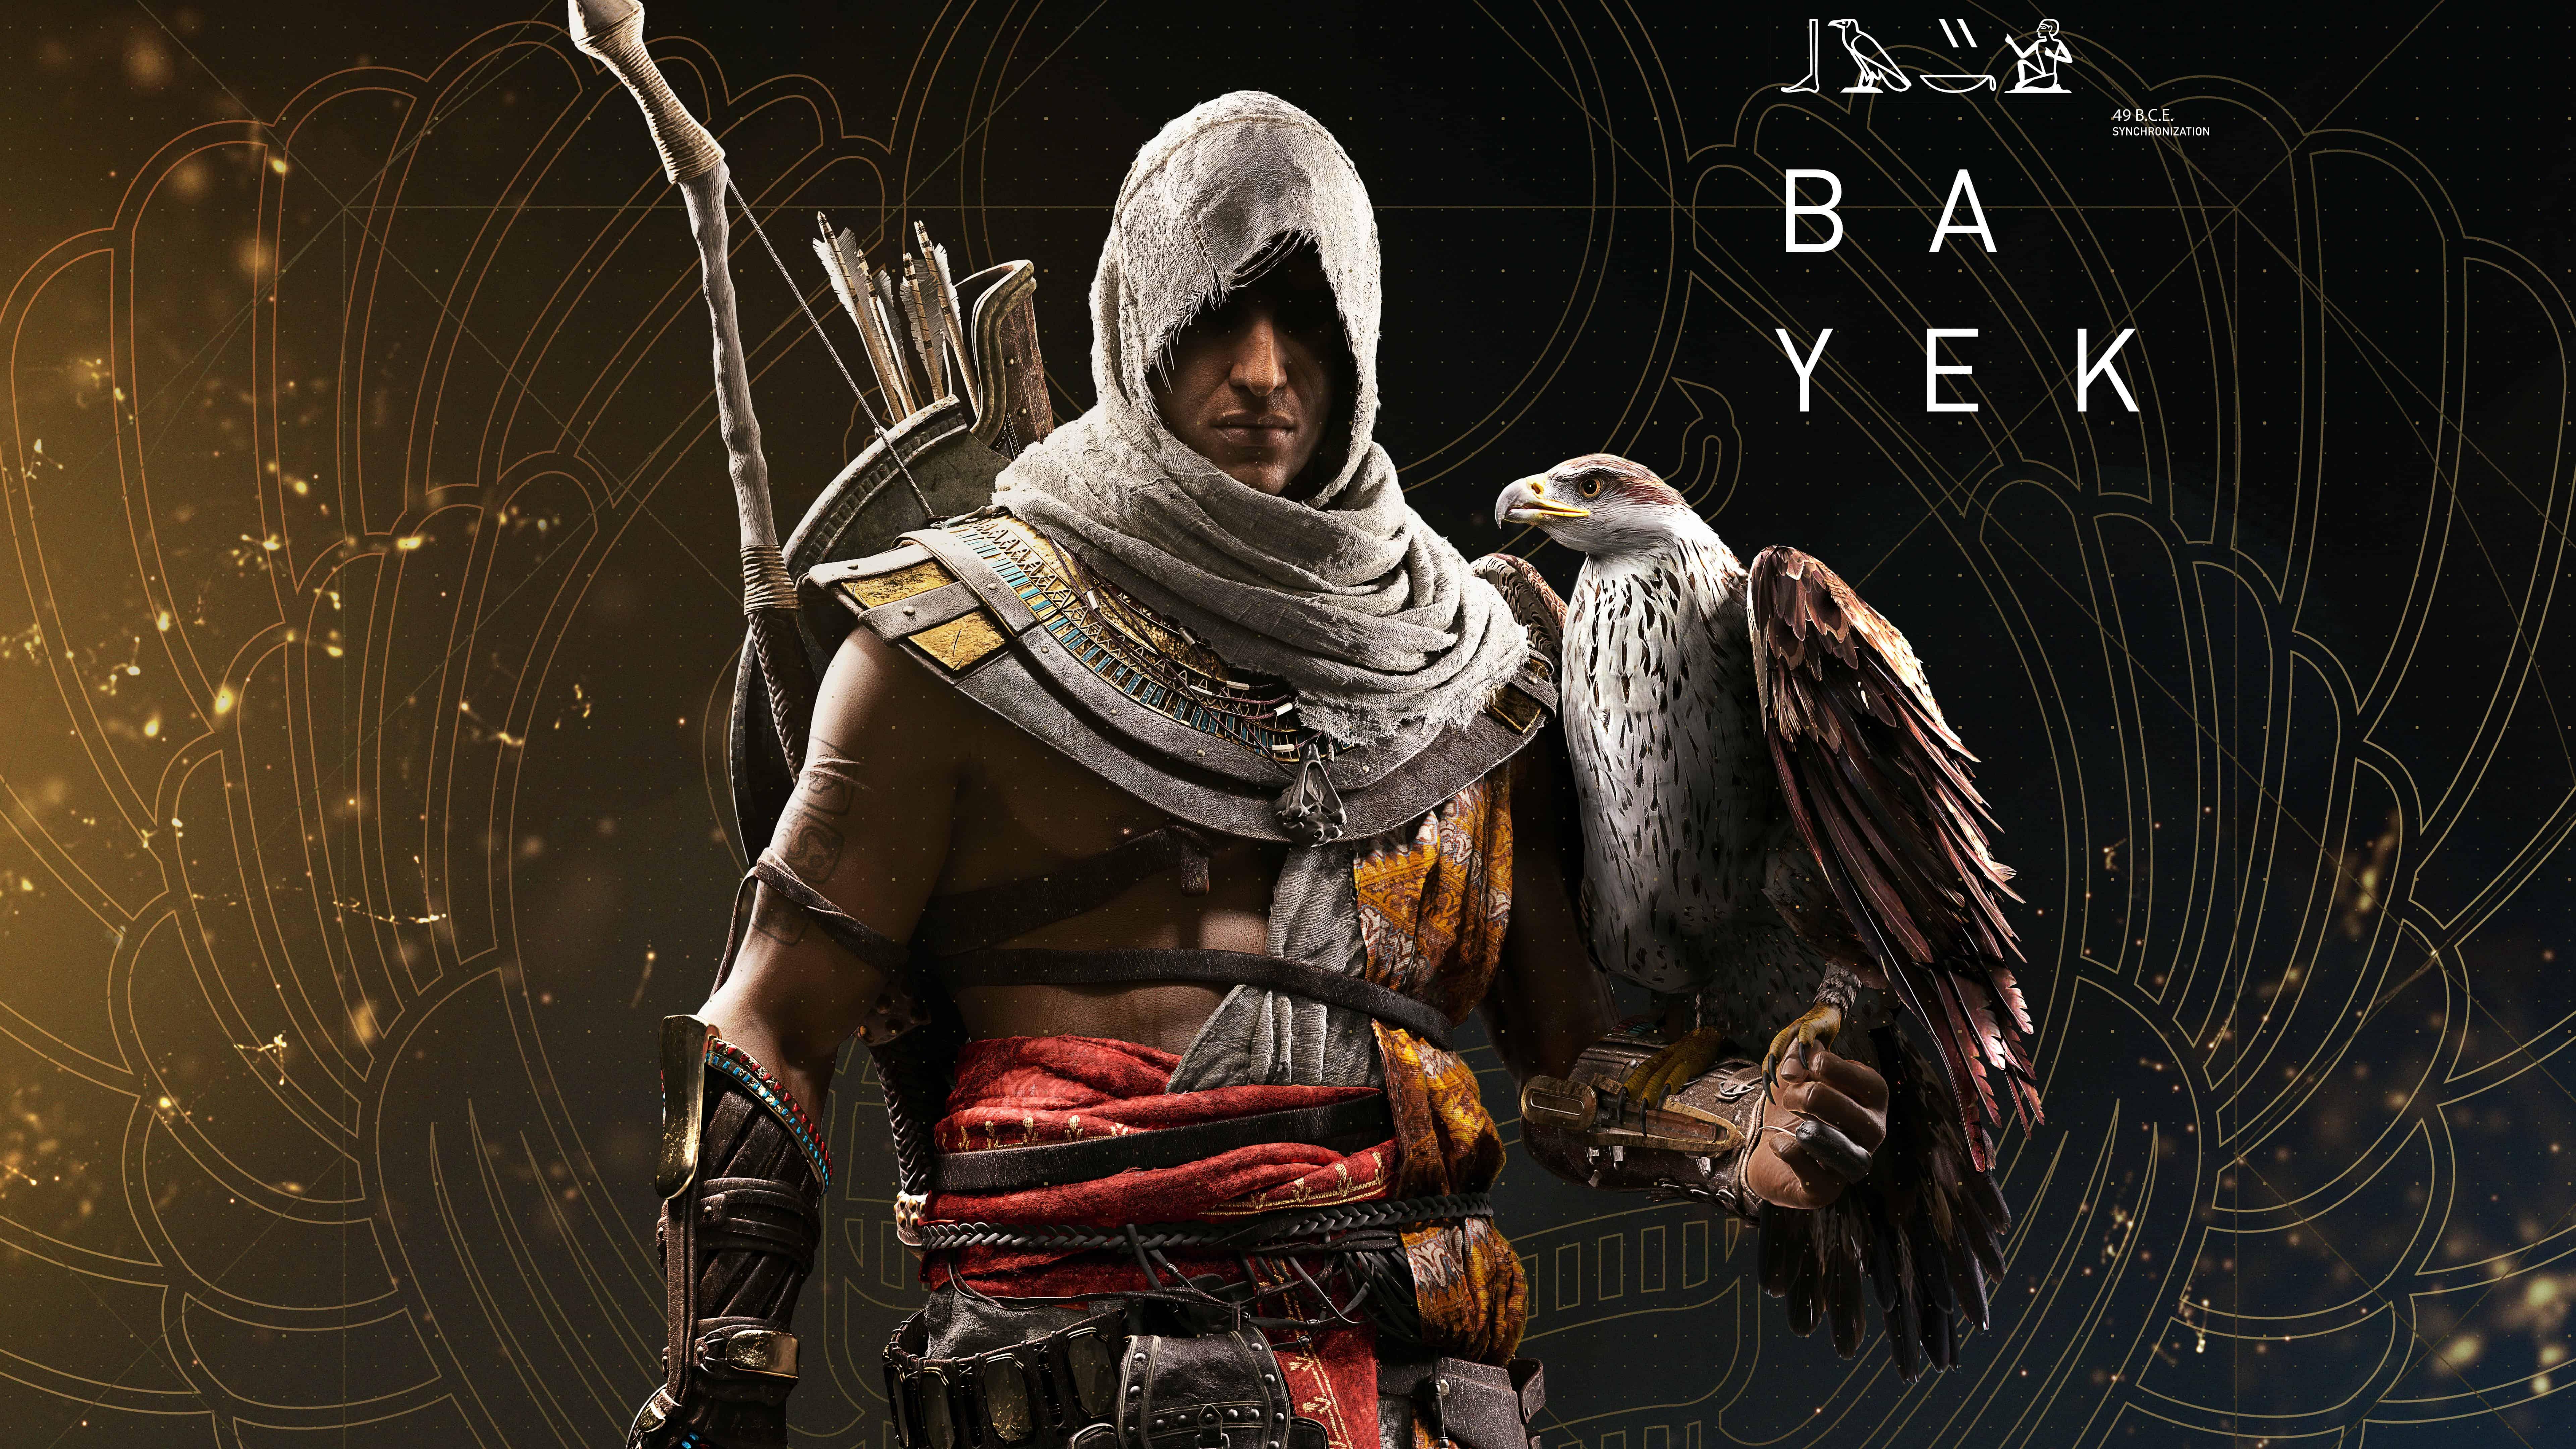 assassins creed origins bayek and eagle uhd 8k wallpaper